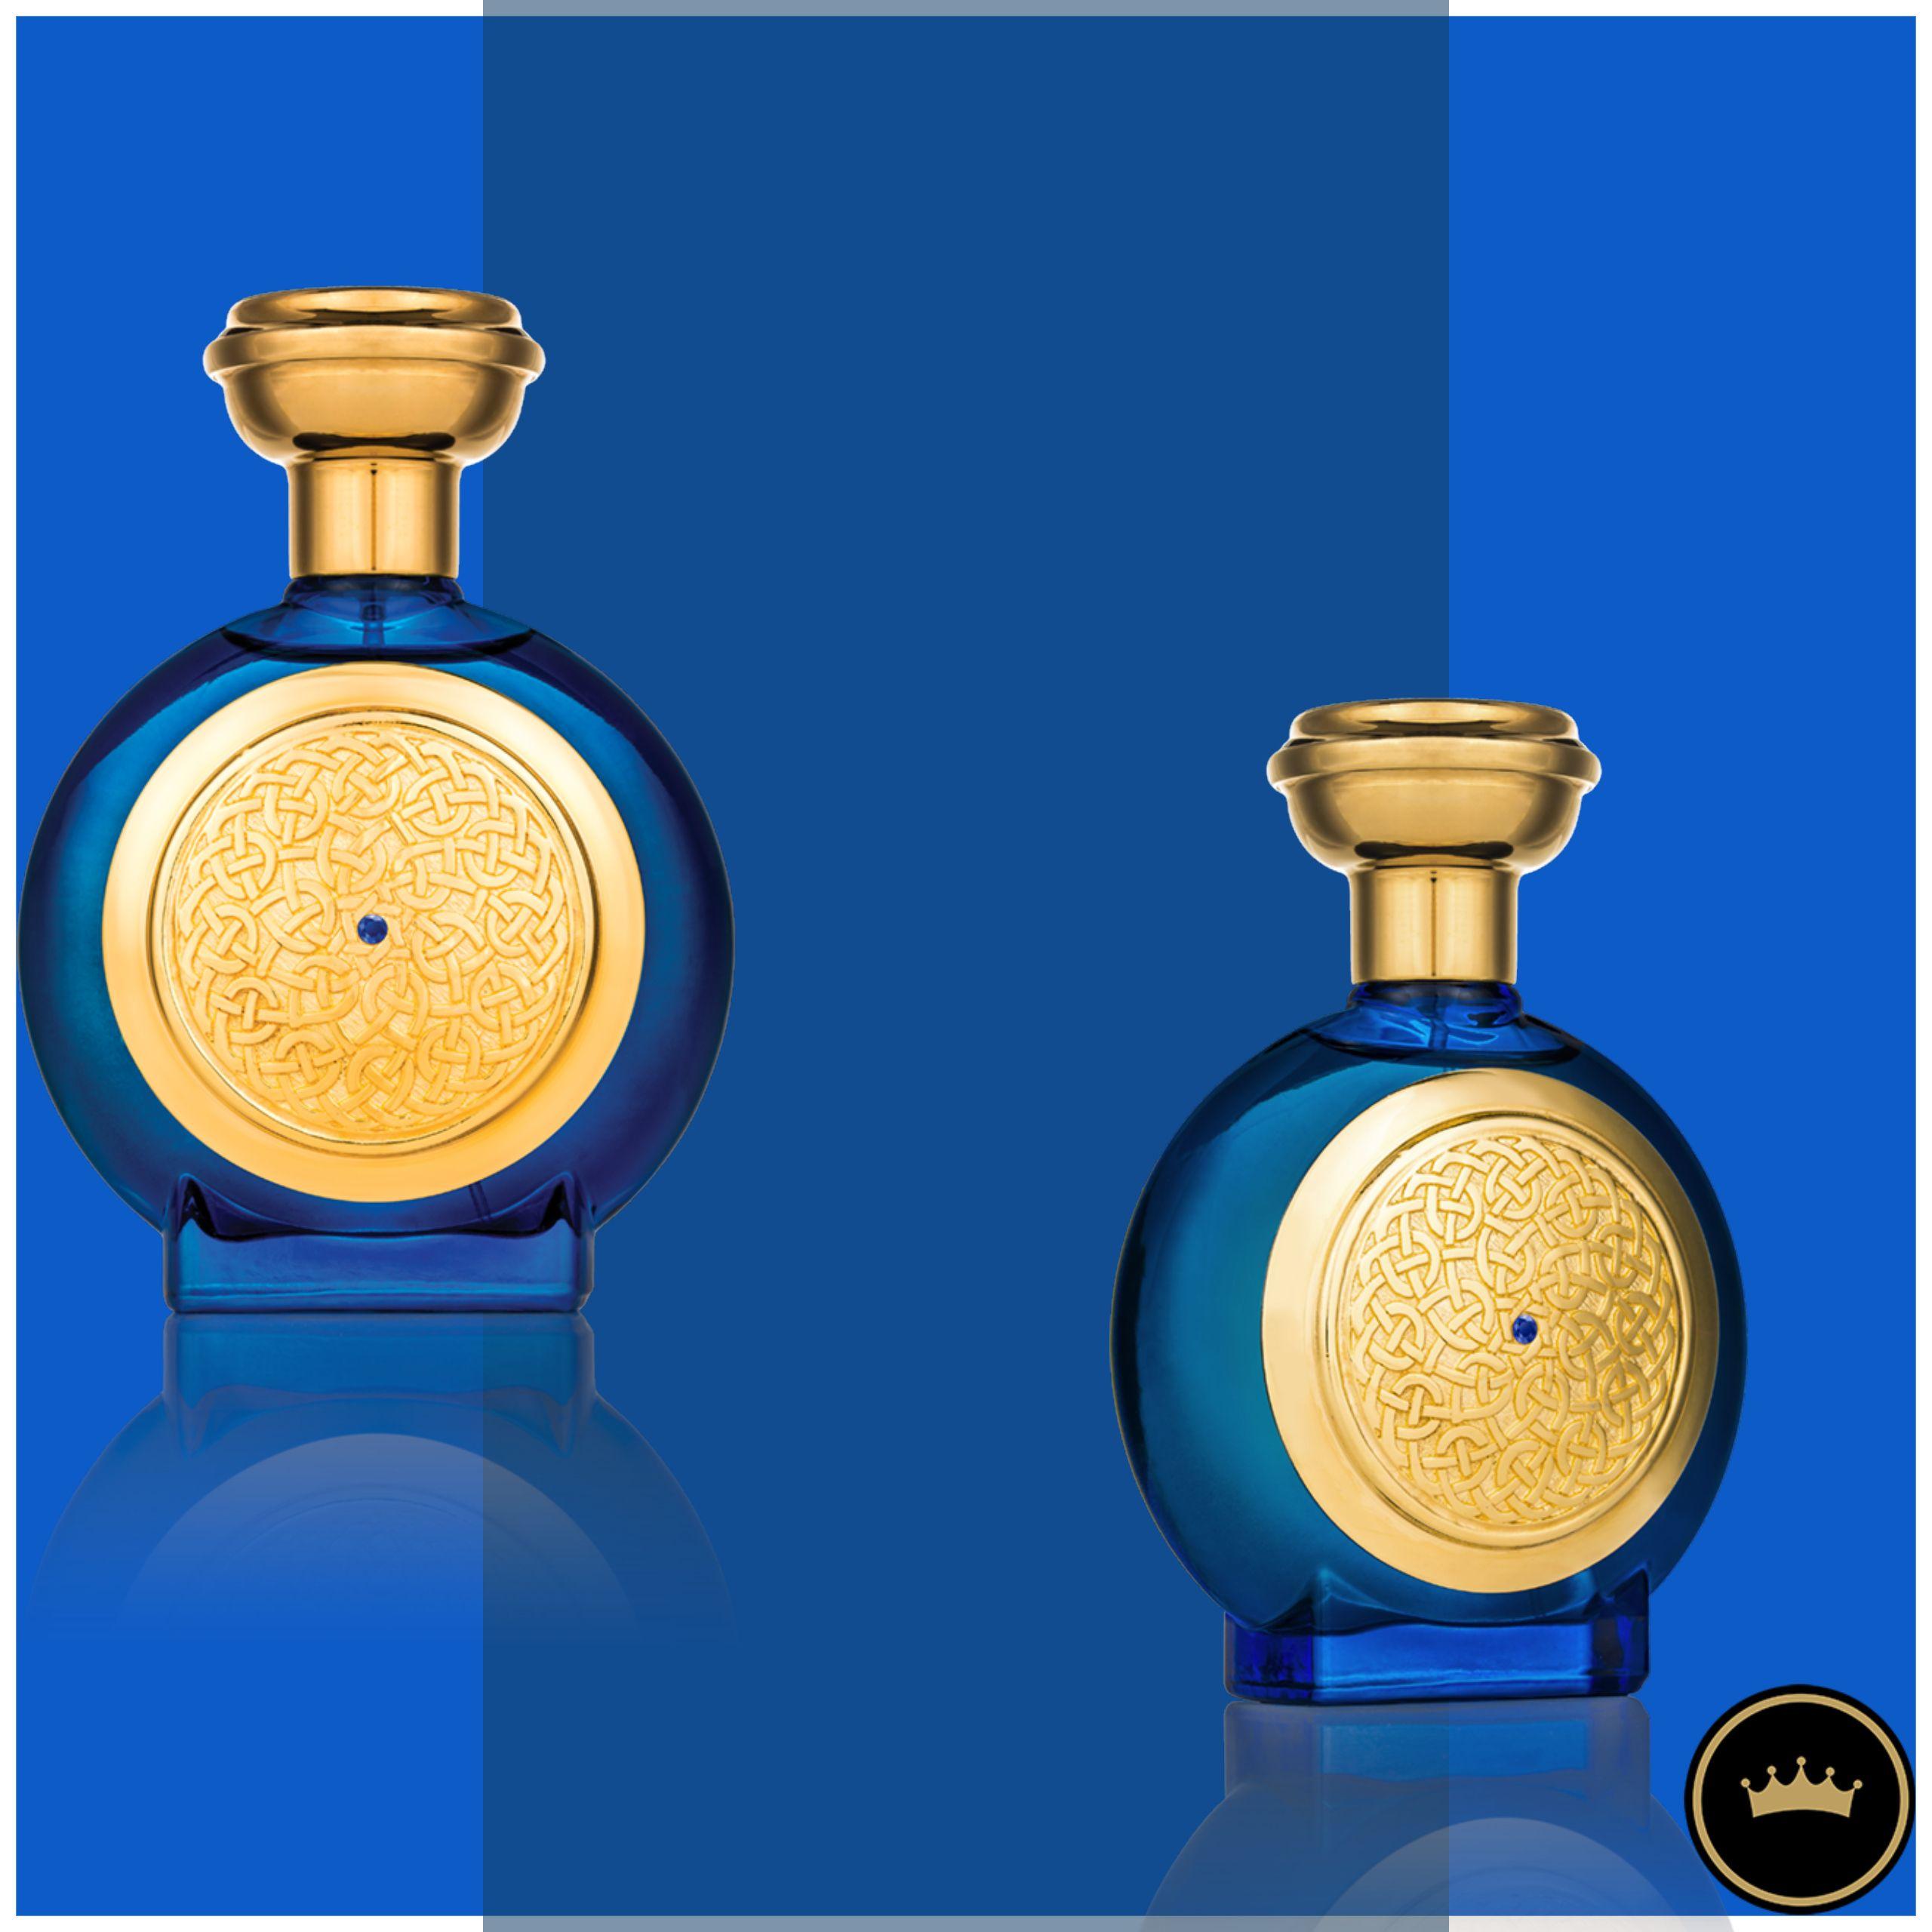 Kanarygifts عطر بلو سافير الخطير من بوديسيا ب 3000 Blue Sapphire By Boadicea The Victorious 100ml For Men And Women Eau Perfume Eau De Parfum Blue Perfume